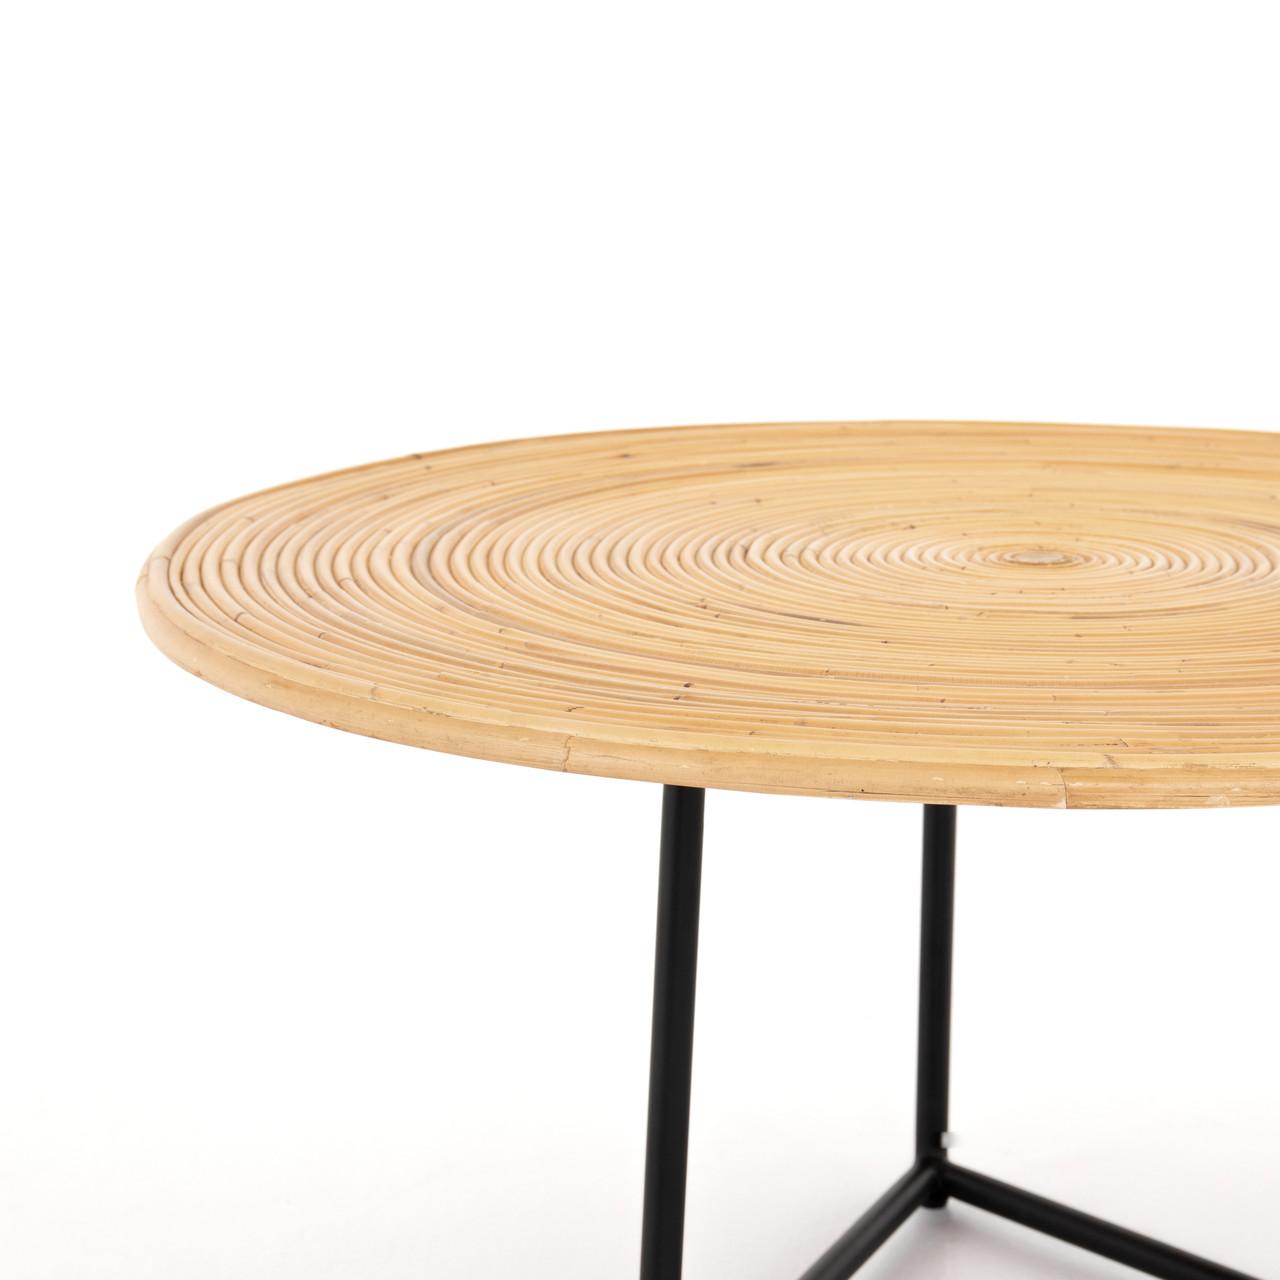 Clover Round Coffee Table-Honey Rattan